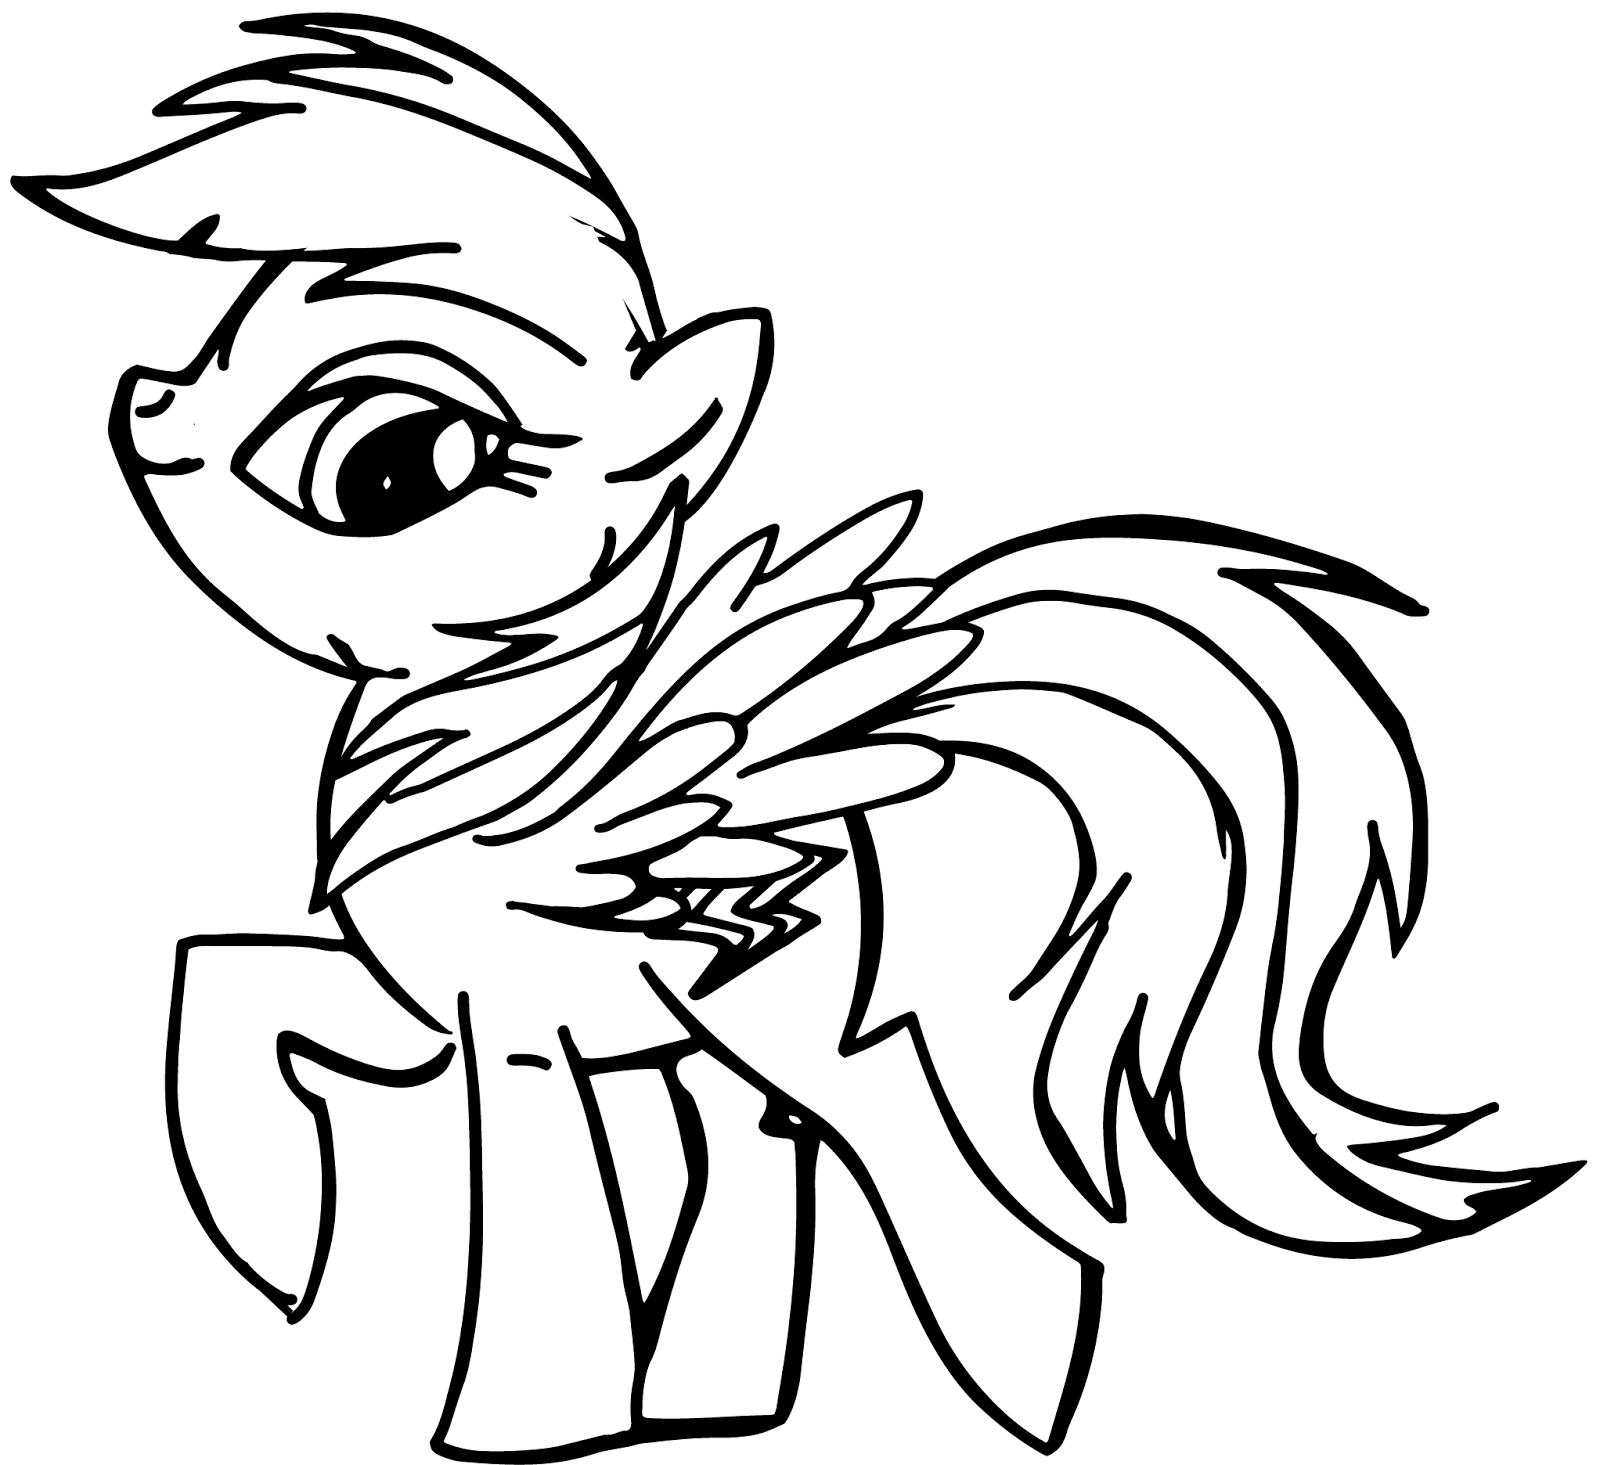 Drawn my little pony de mi Original coloring pata  colorear